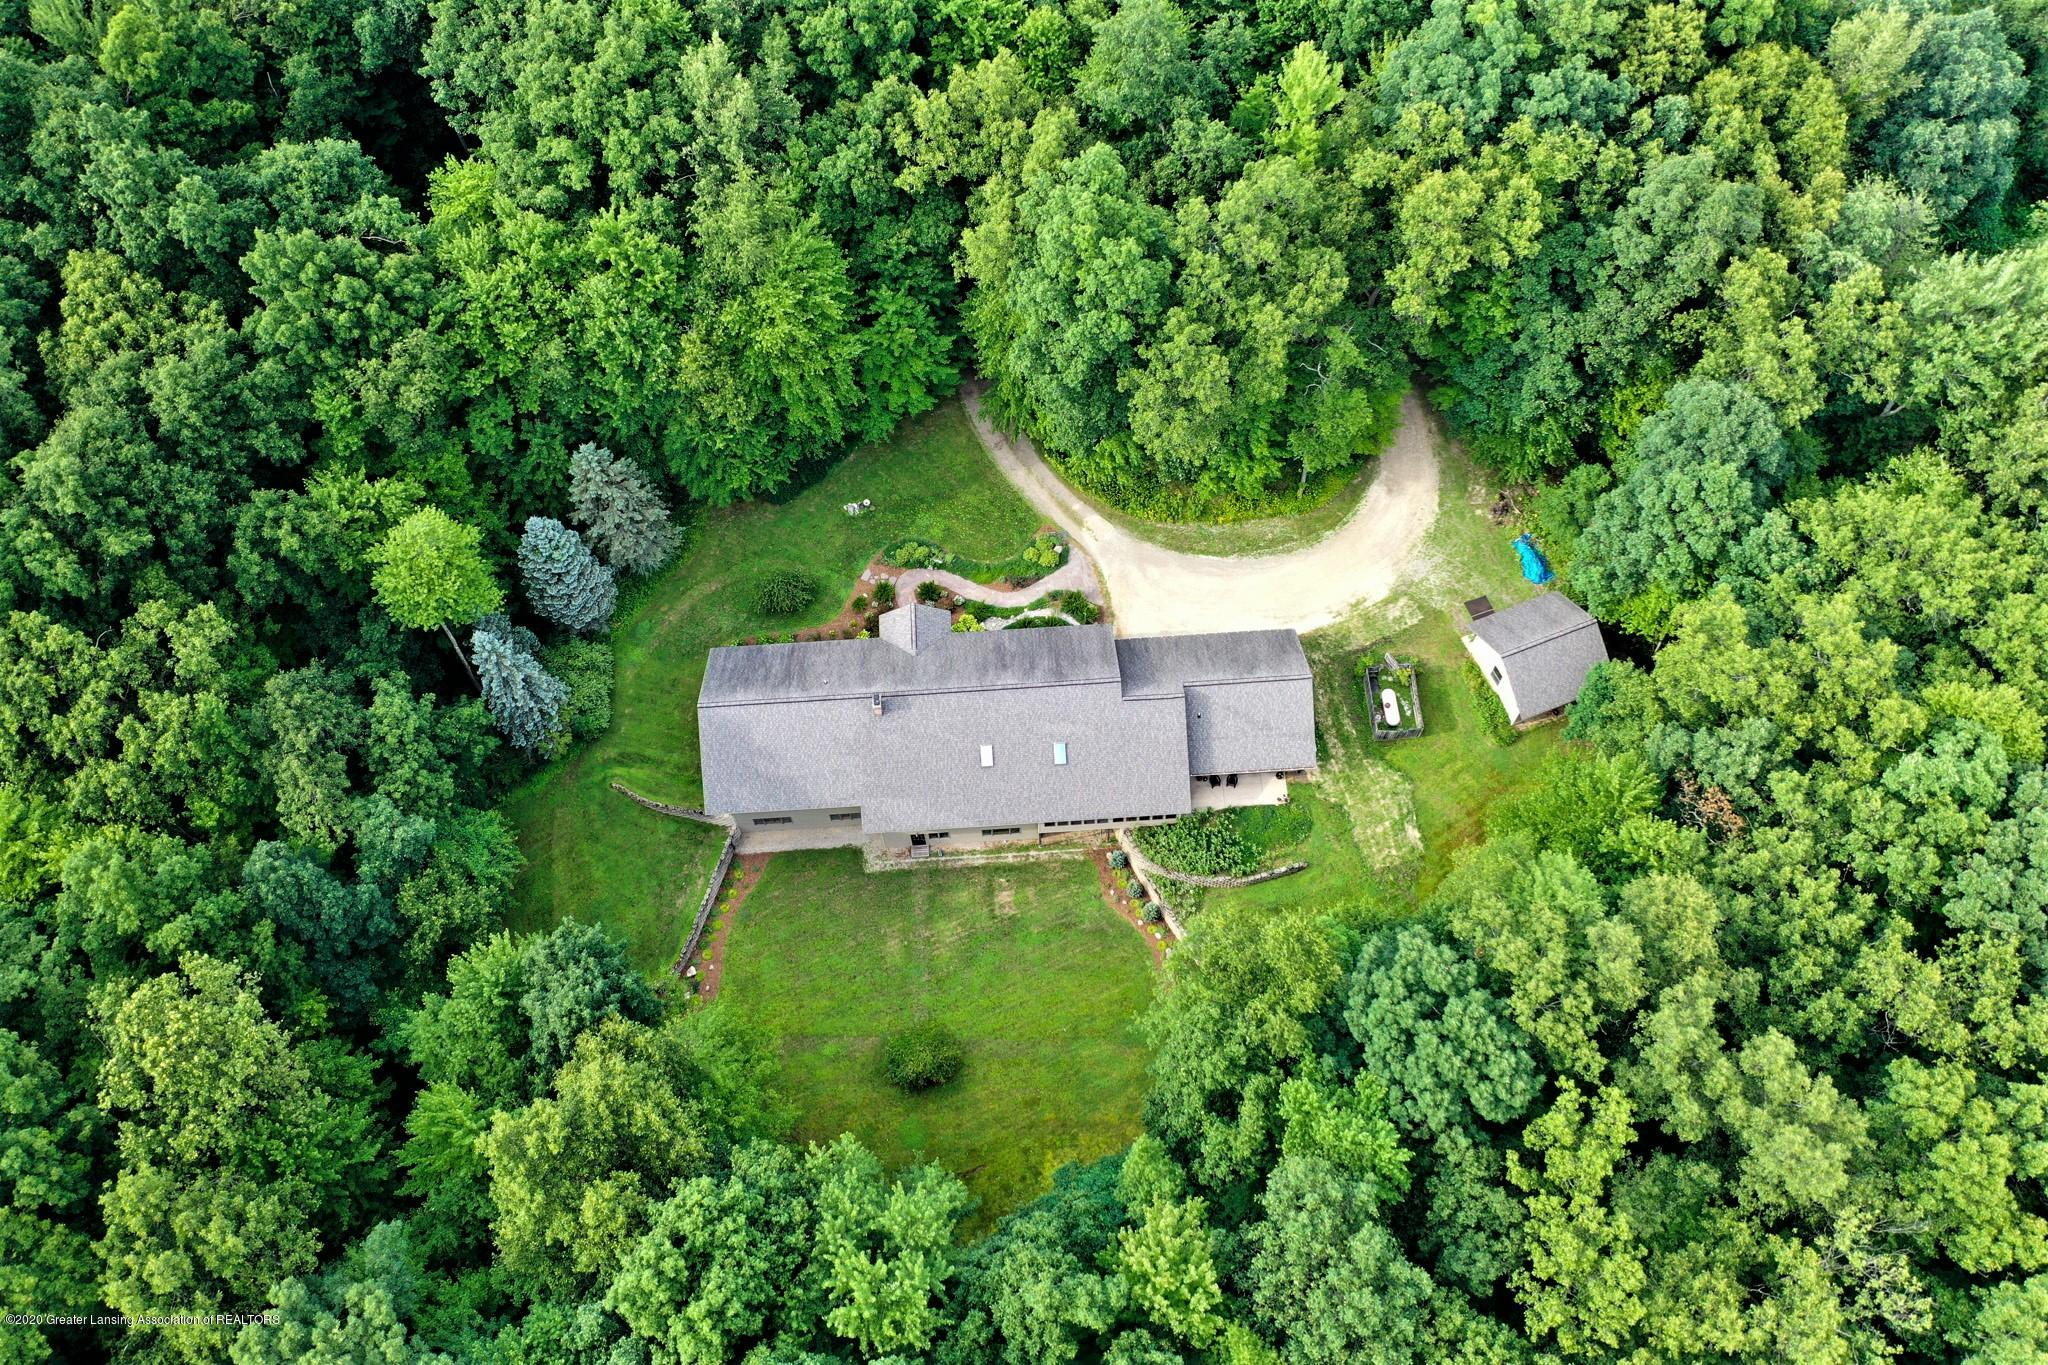 1670 Milton Rd - Aerial view - 1